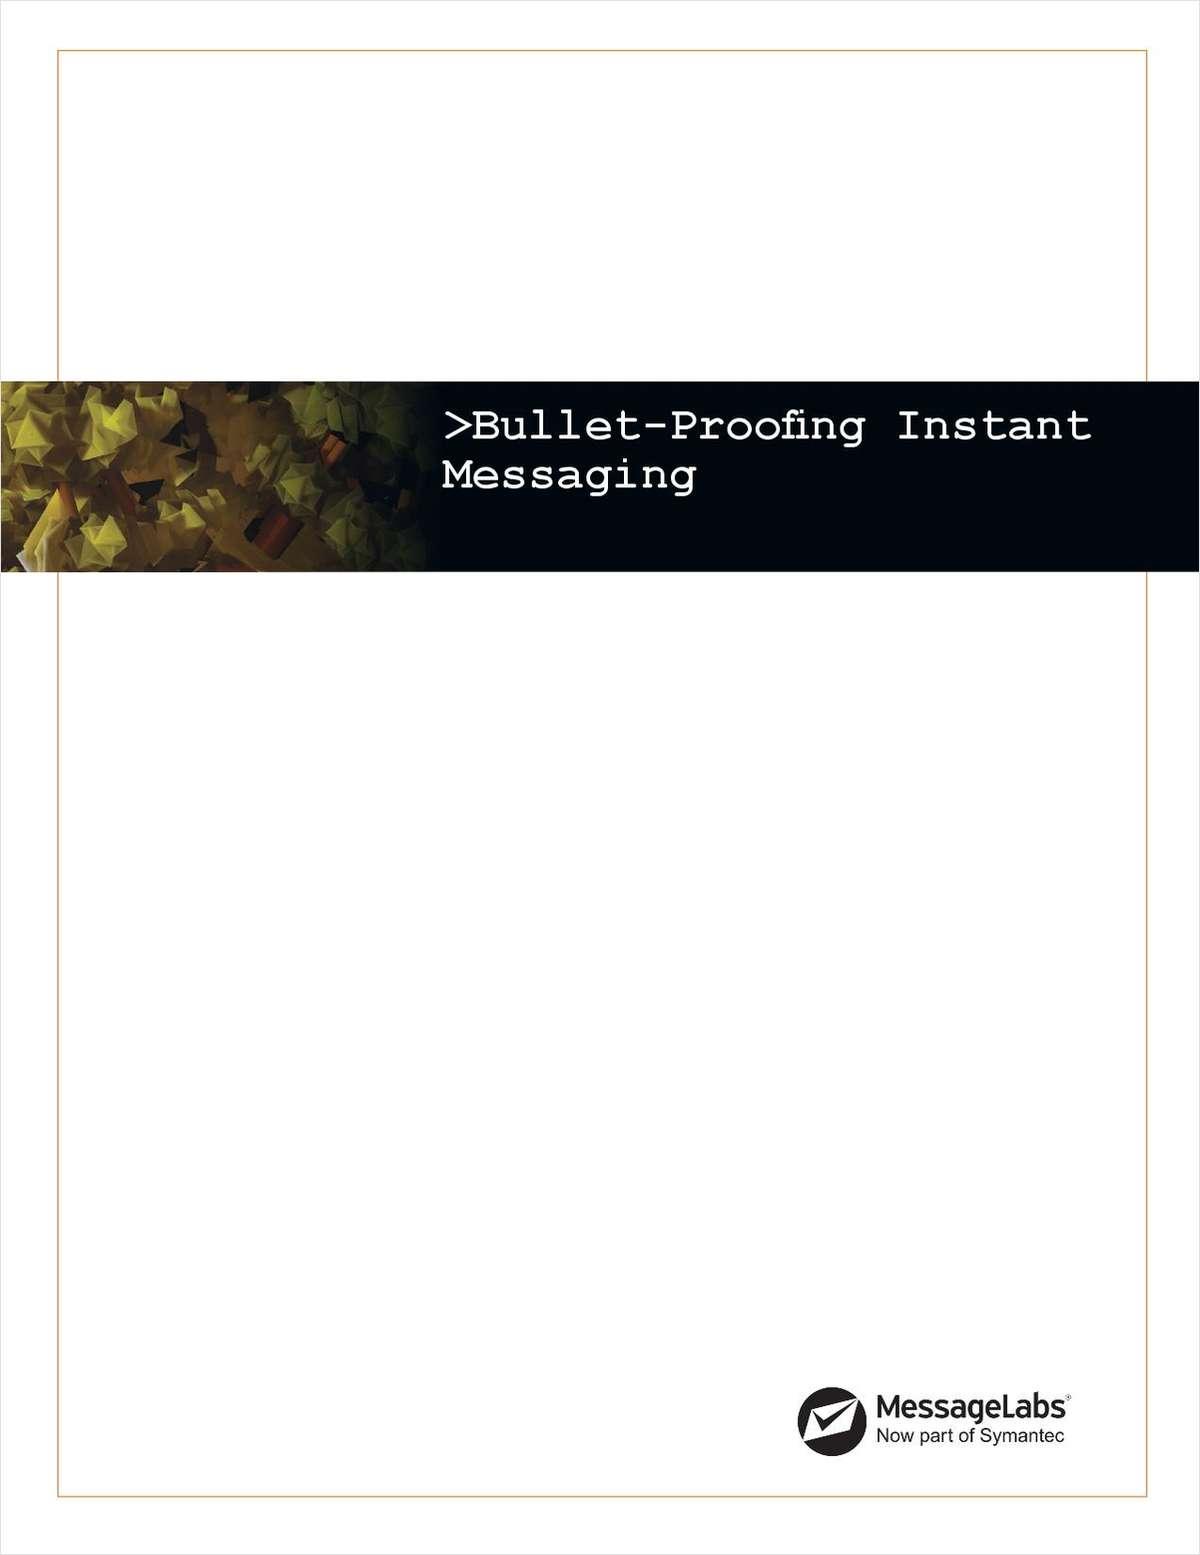 Bullet-Proofing Instant Messaging